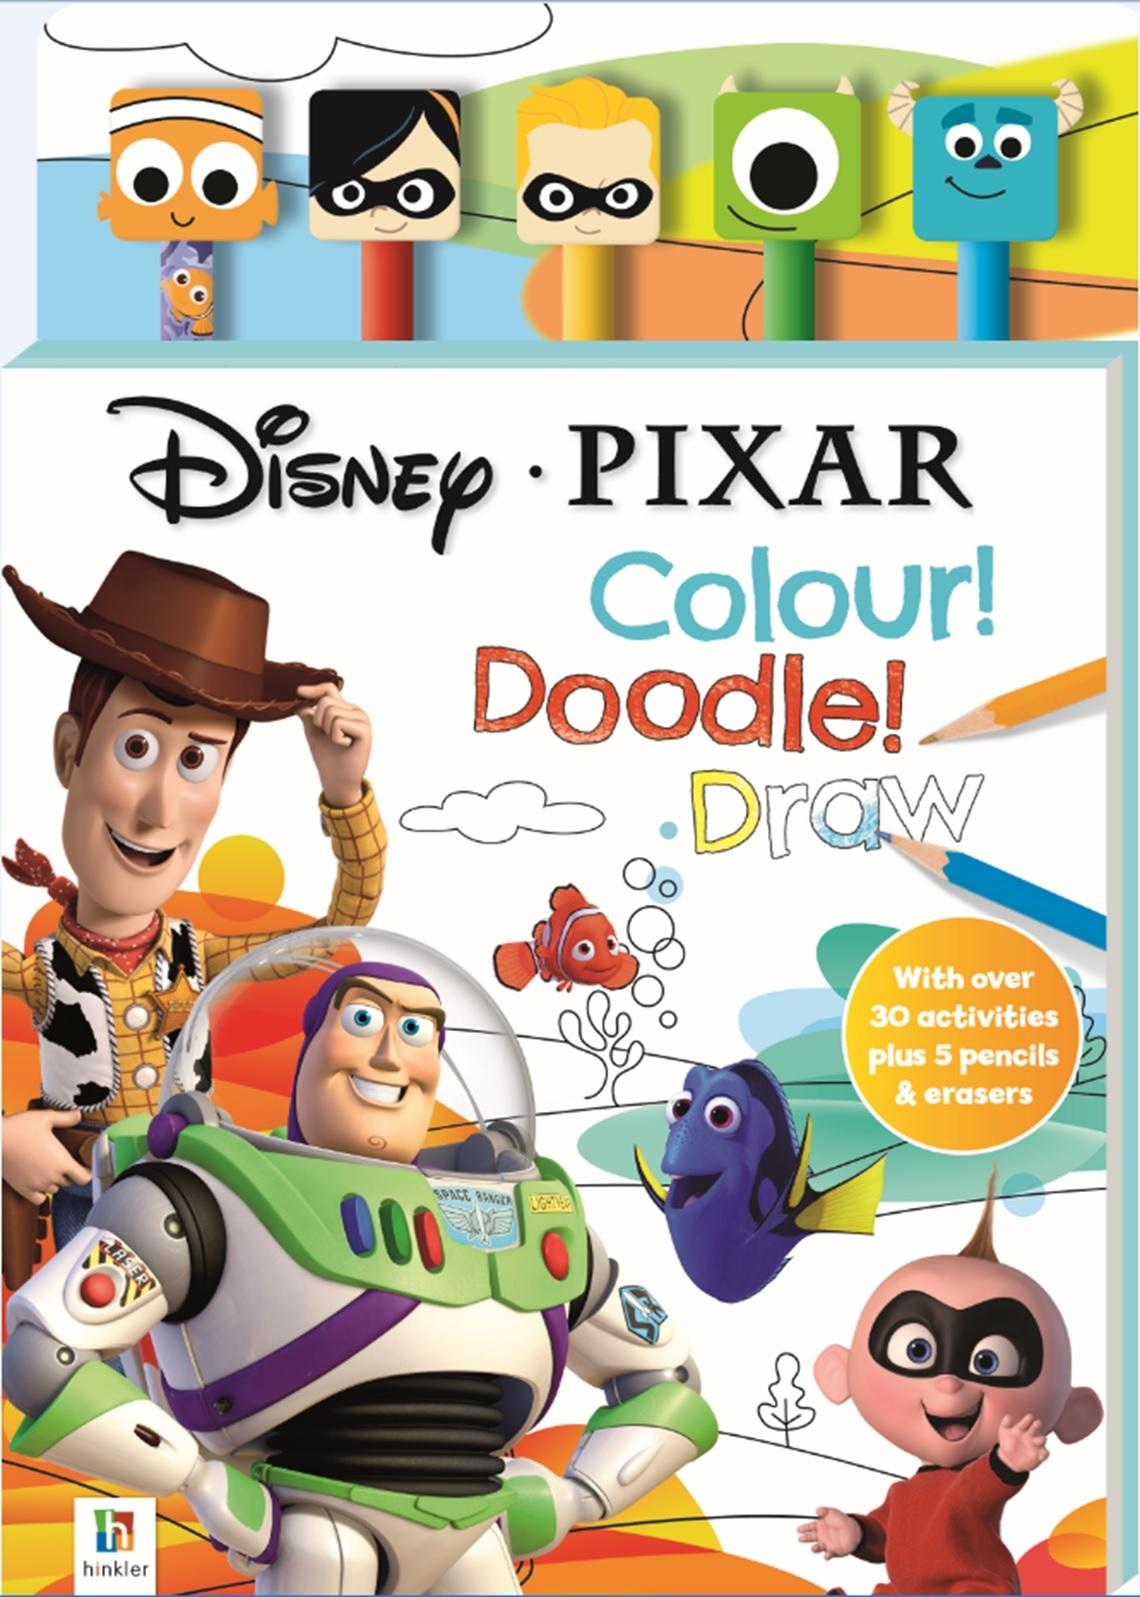 Disney Pixar: Pencil & Eraser - 5-Piece Set image